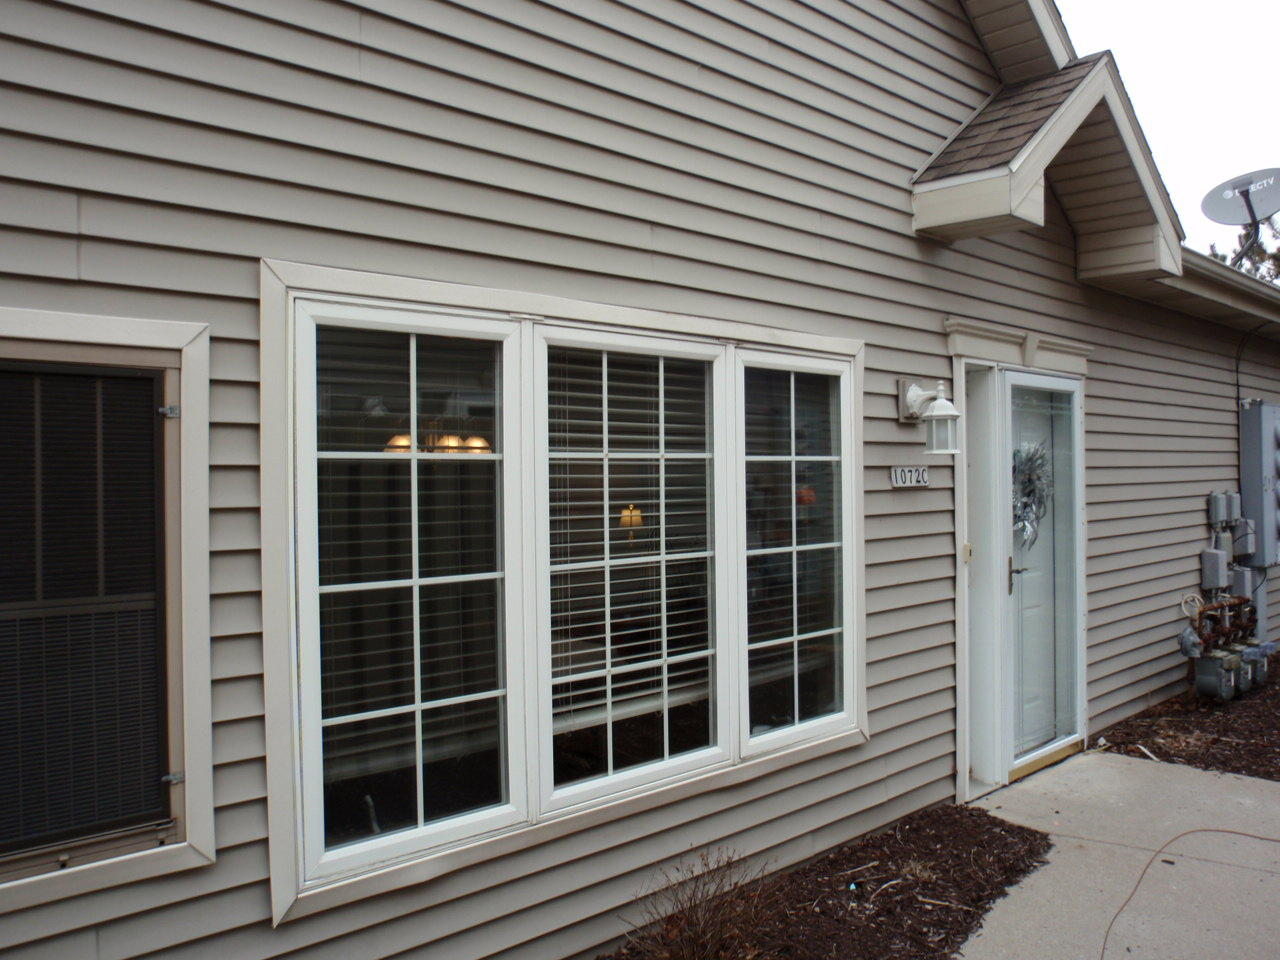 1072 Quinlan Dr, Pewaukee, Wisconsin 53072, 2 Bedrooms Bedrooms, ,2 BathroomsBathrooms,Condominiums,For Sale,Quinlan Dr,1,1621771